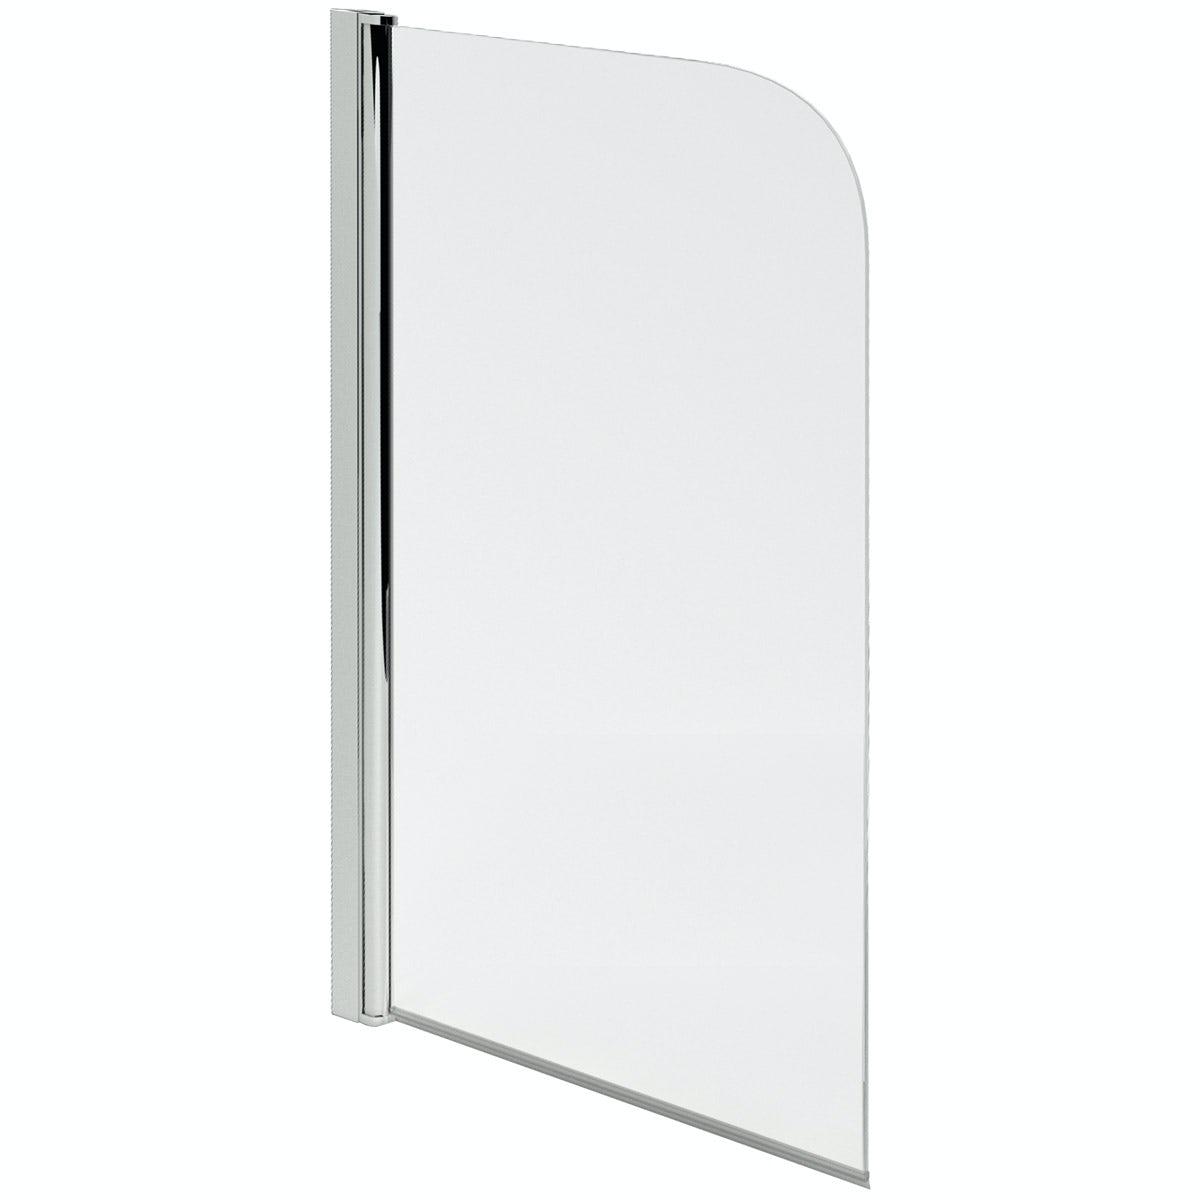 Ideal Standard Connect radius bath screen